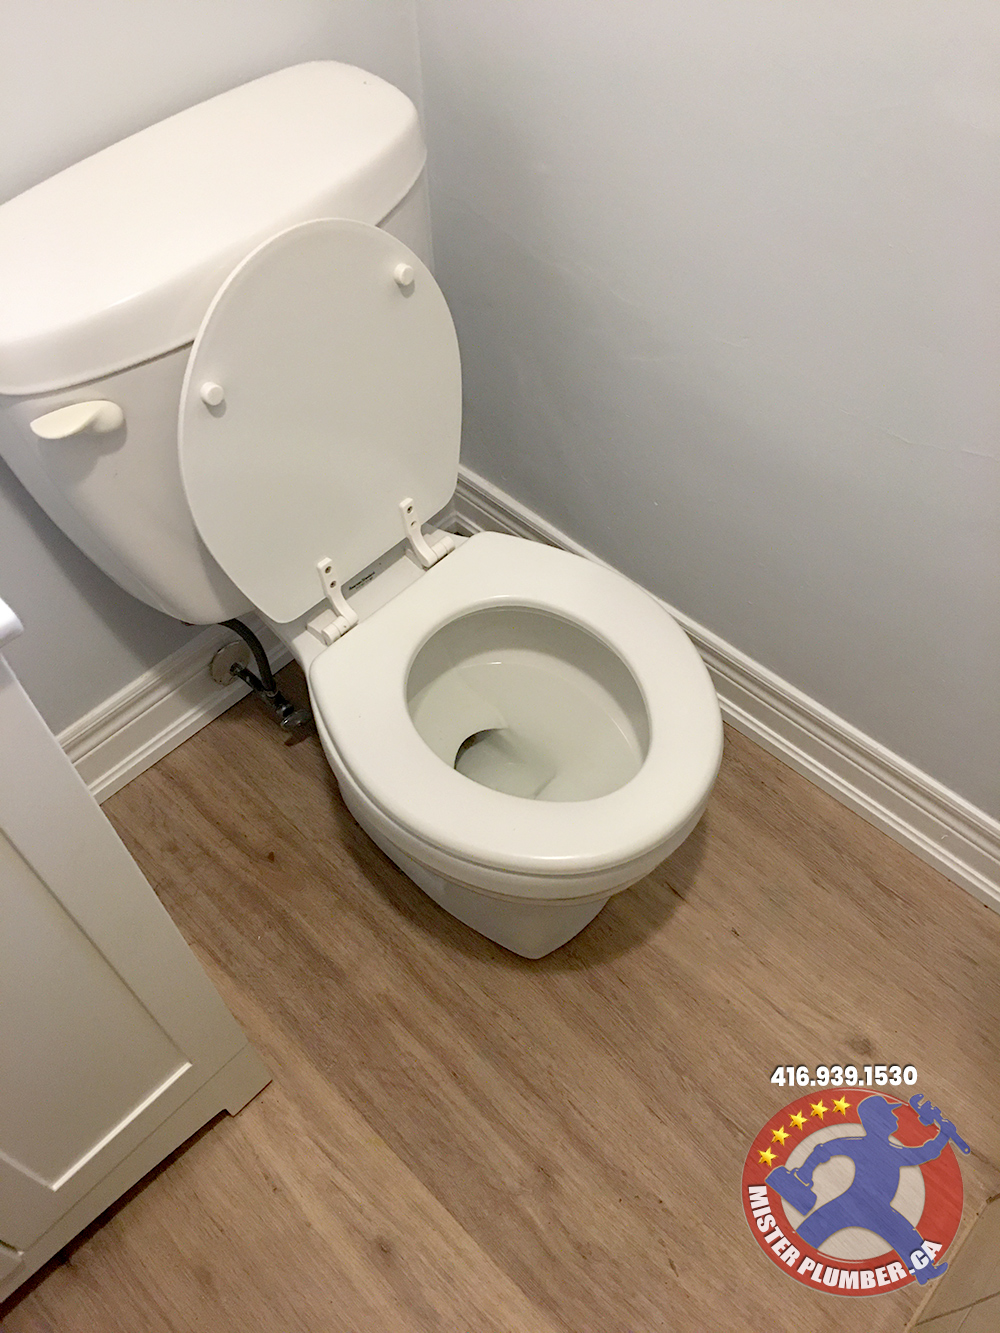 Toilet re-installation after flooring upgradeby Mister Plumber